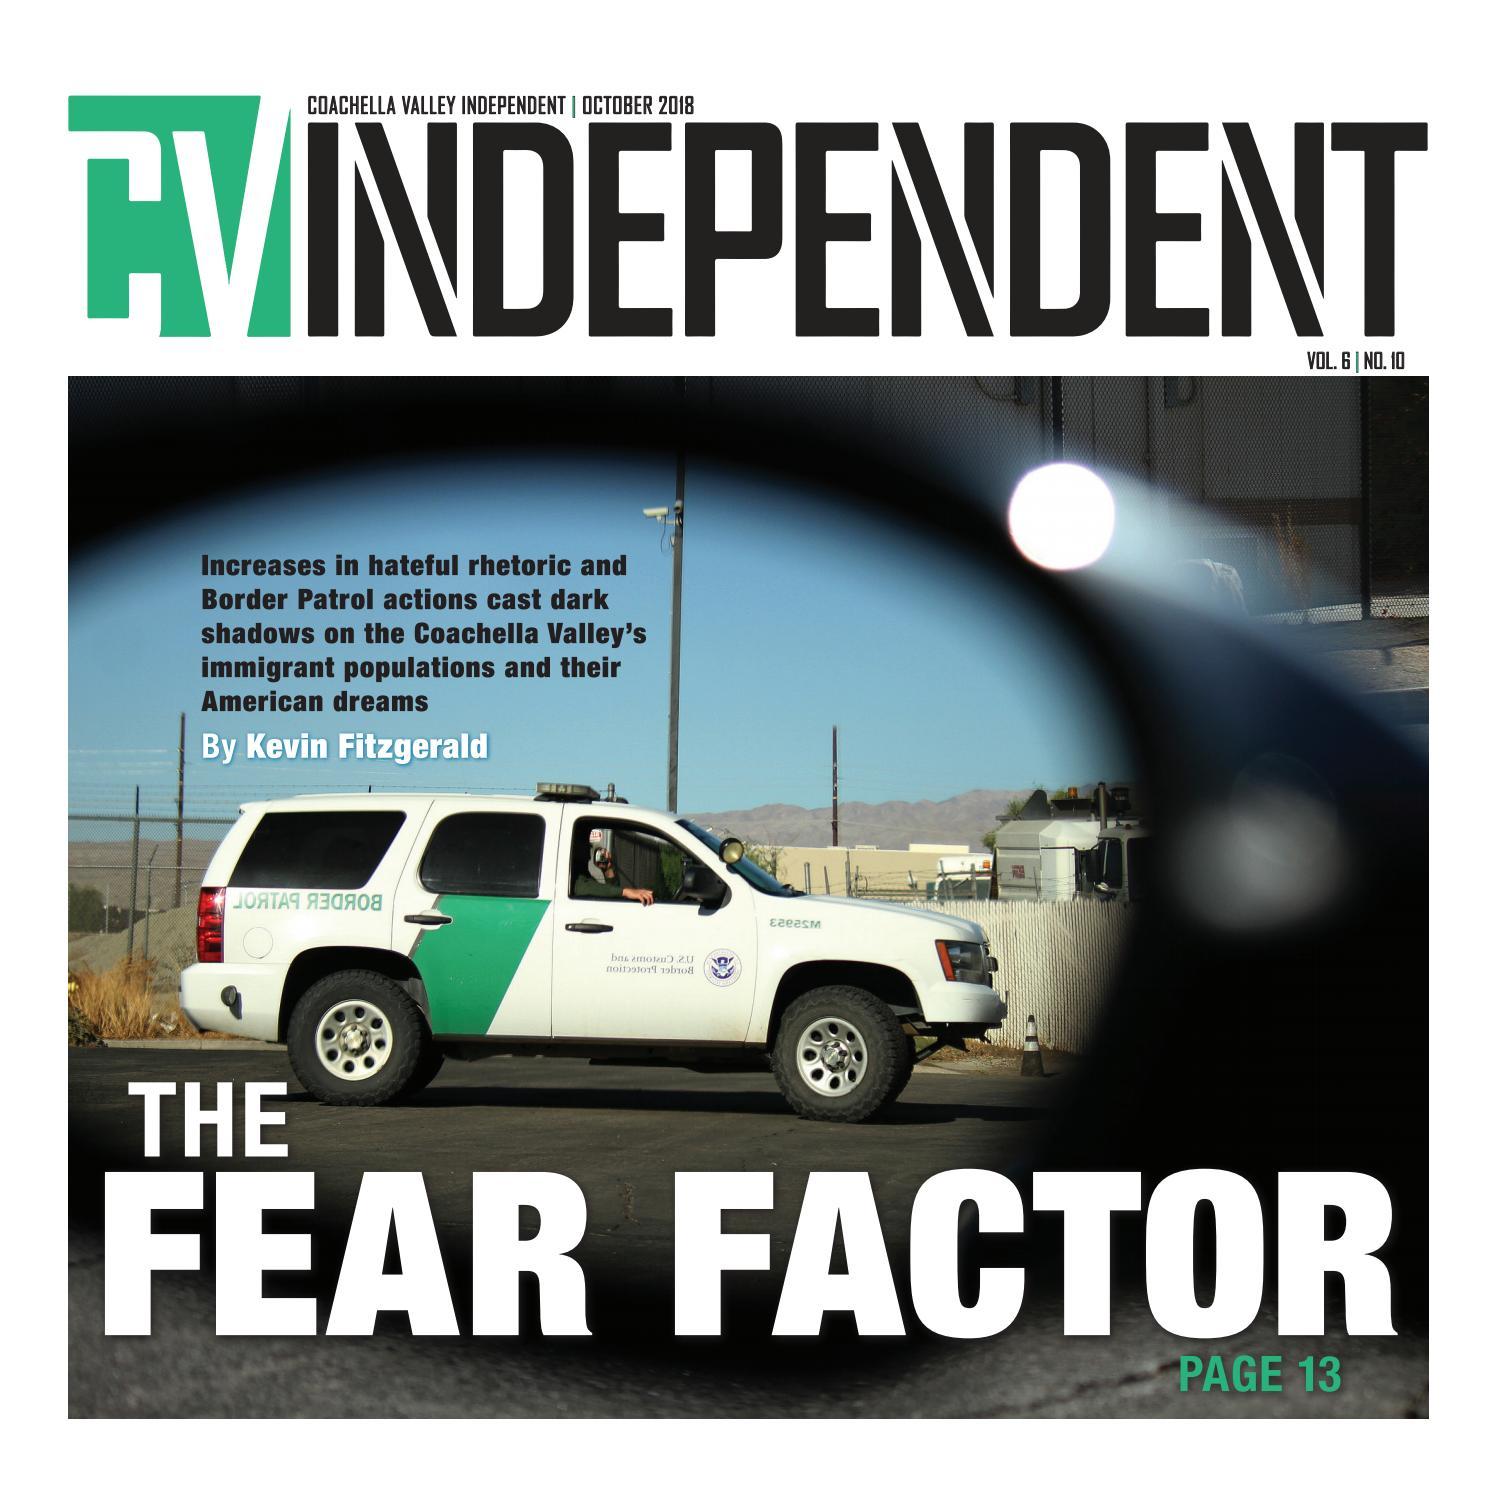 Coachella Valley Independent October 2018 by Coachella Valley